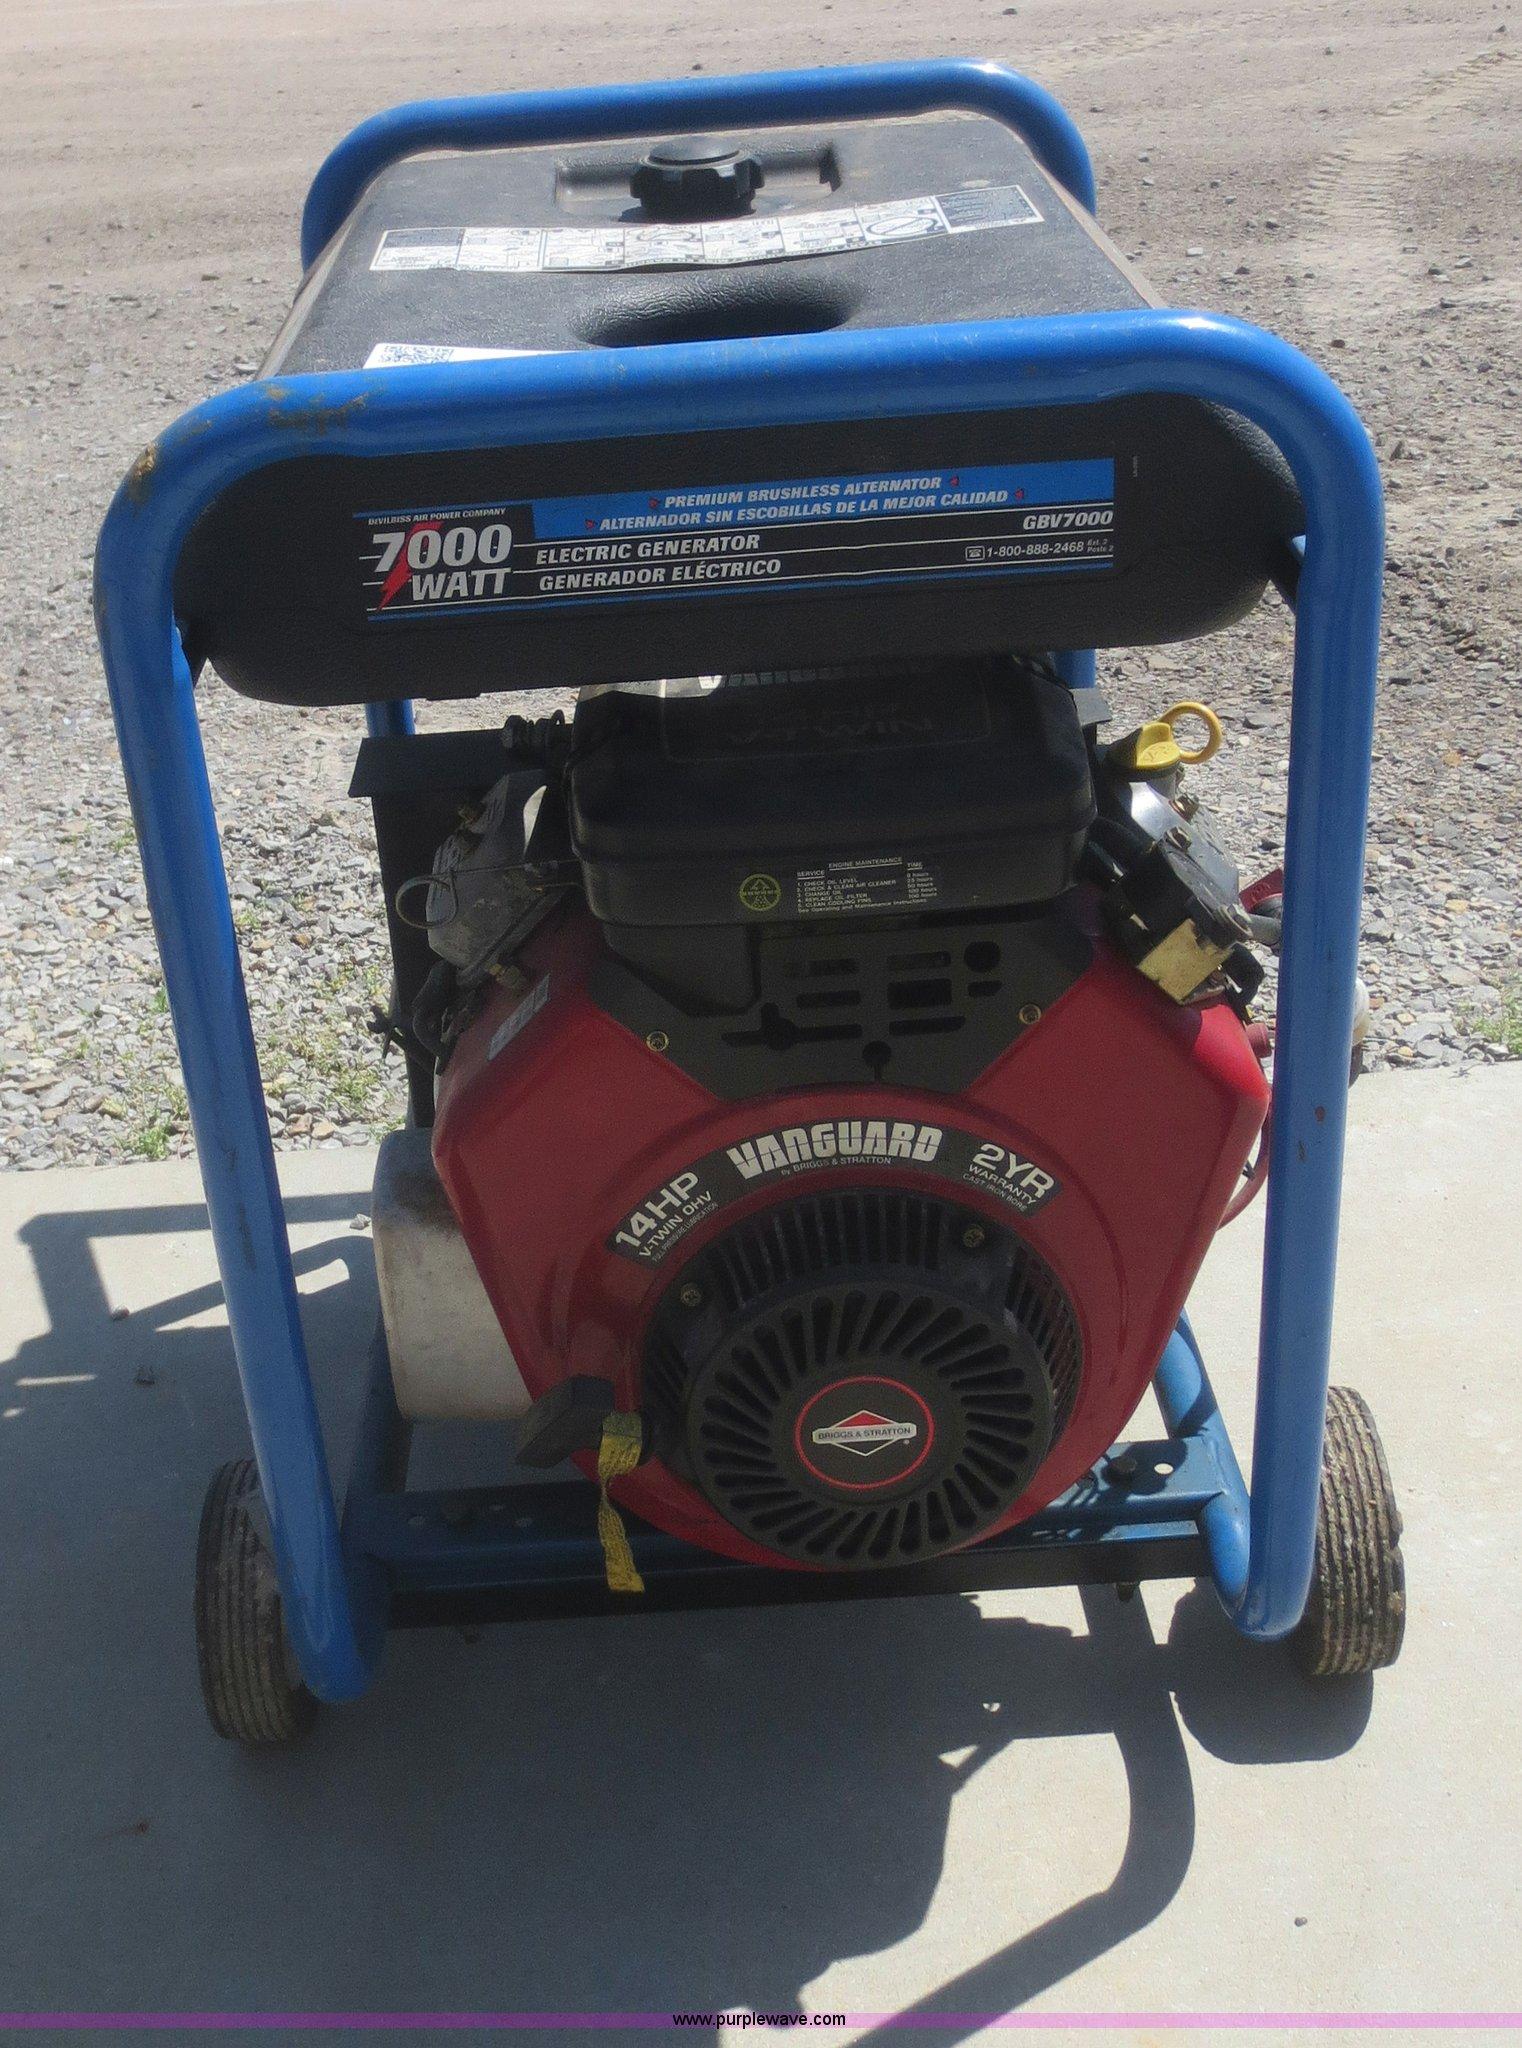 Devilbiss GBV7000 generator   Item F8246   SOLD! June 3 Gove